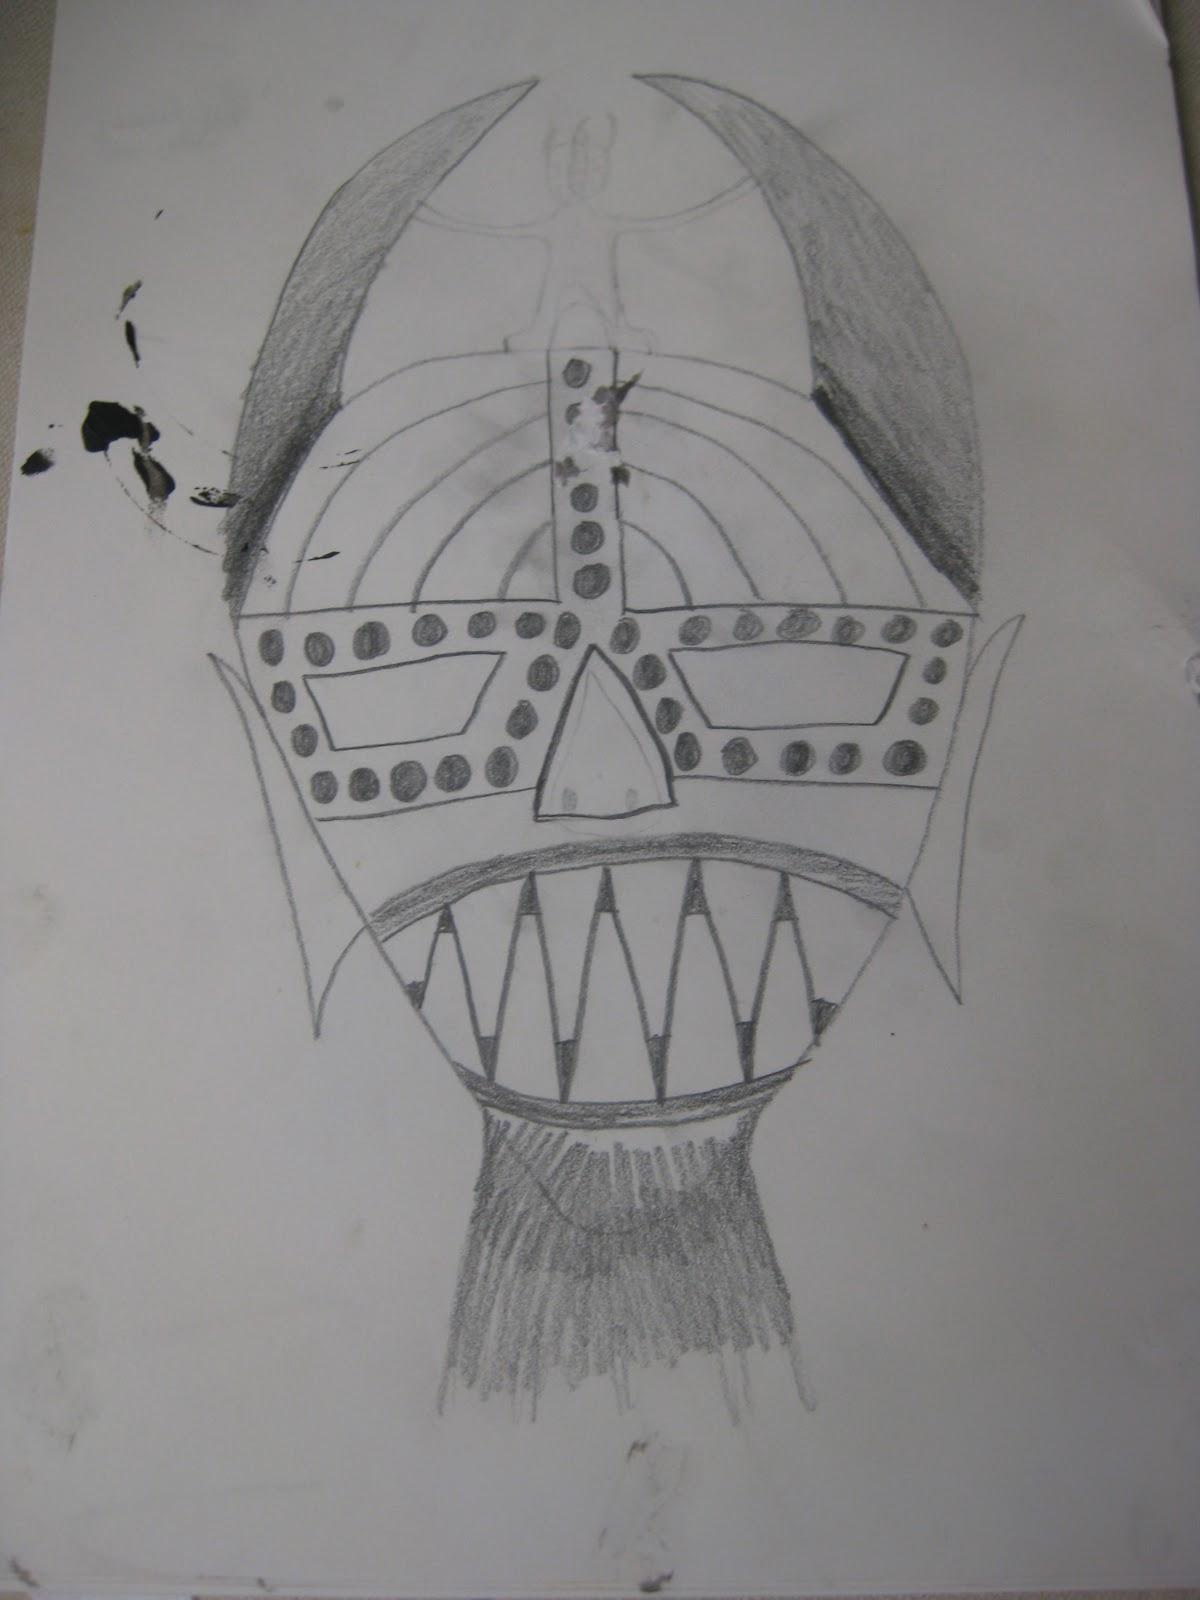 LA Creative Design - Recent Work: Paper Mache African Masks